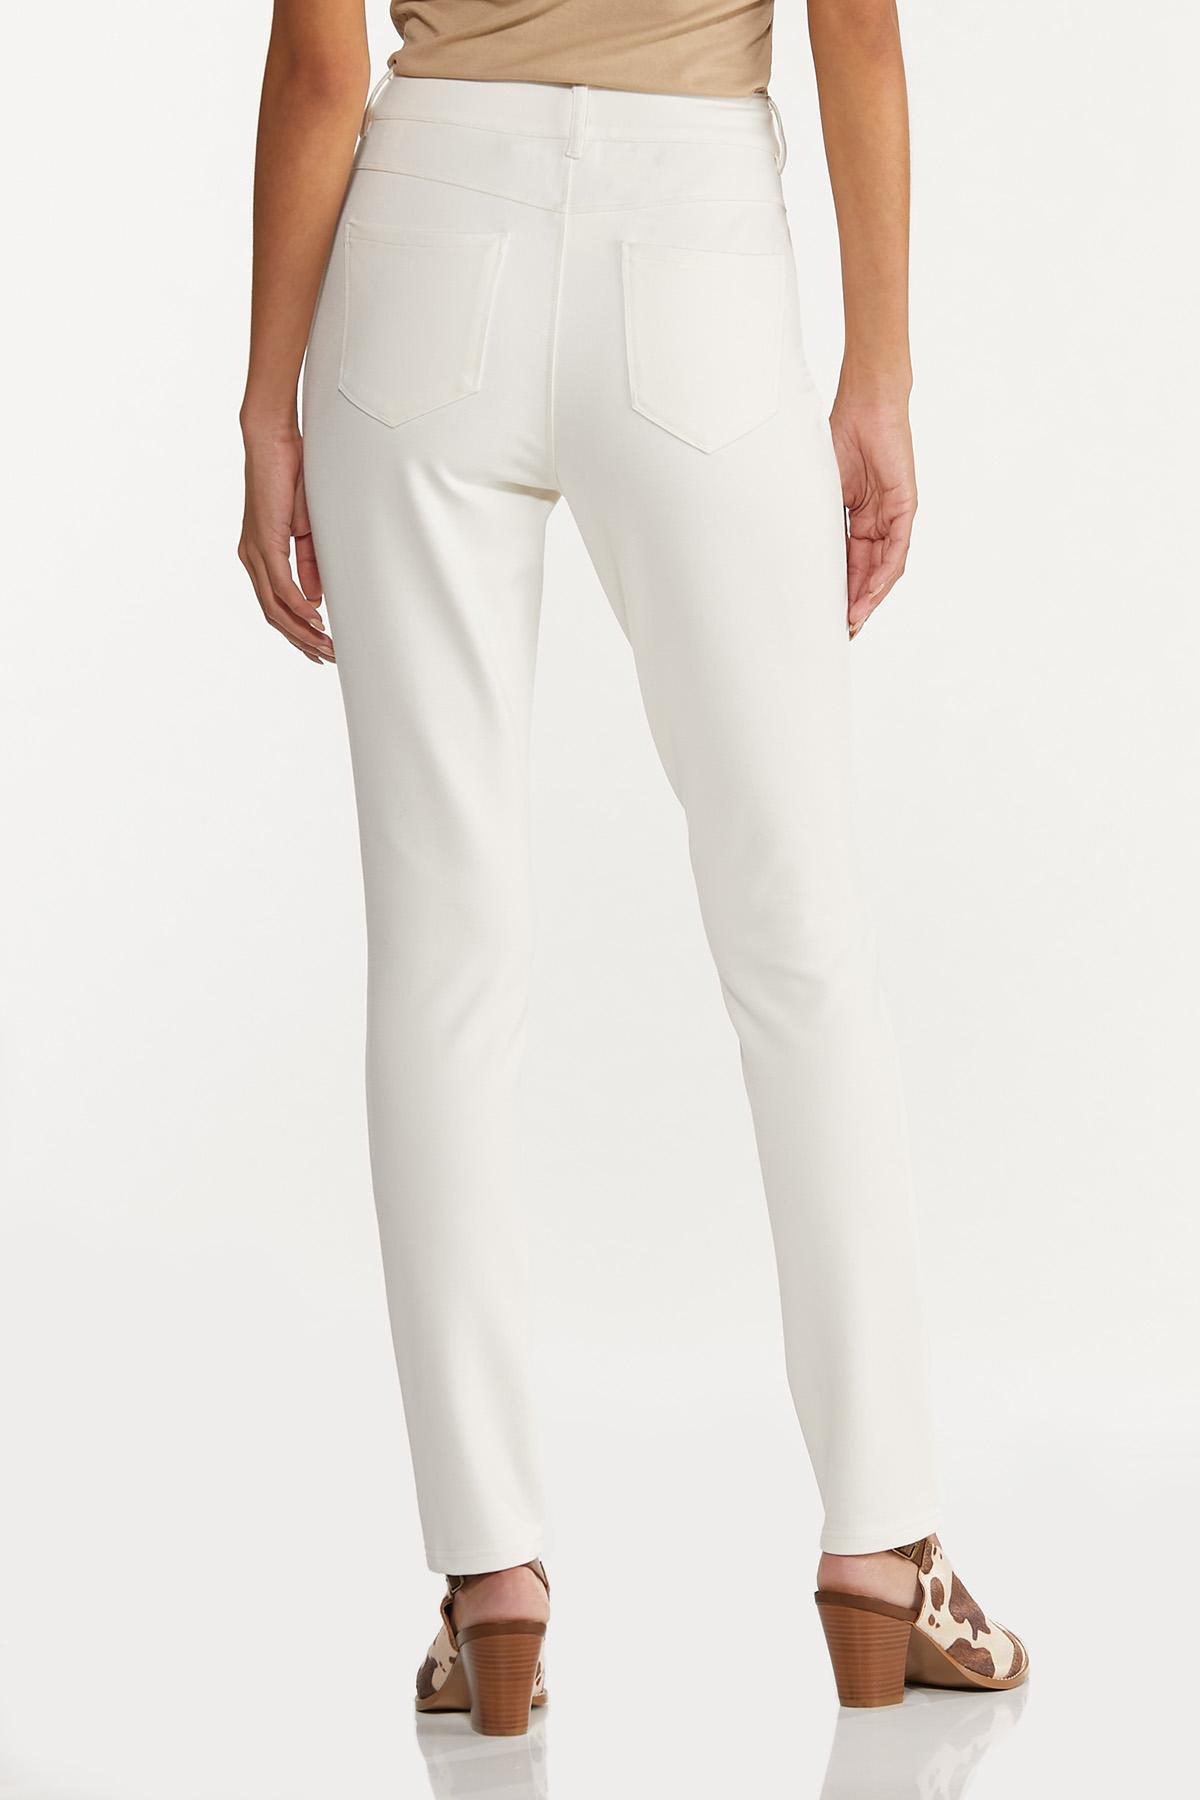 Petite Skinny 5-Pocket Ponte Pants (Item #44623024)